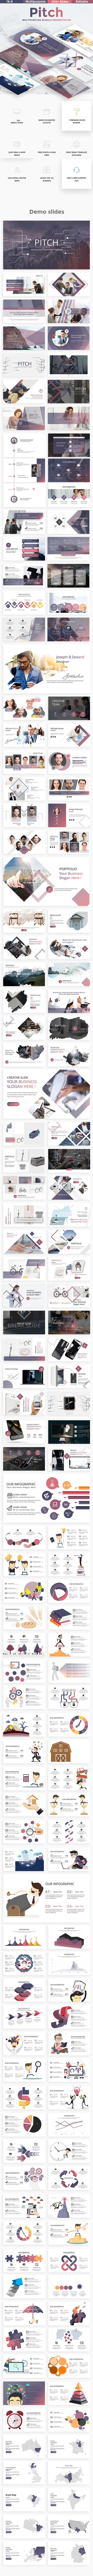 GraphicRiver Pitch Multipurpose Google Slide Template 20997225